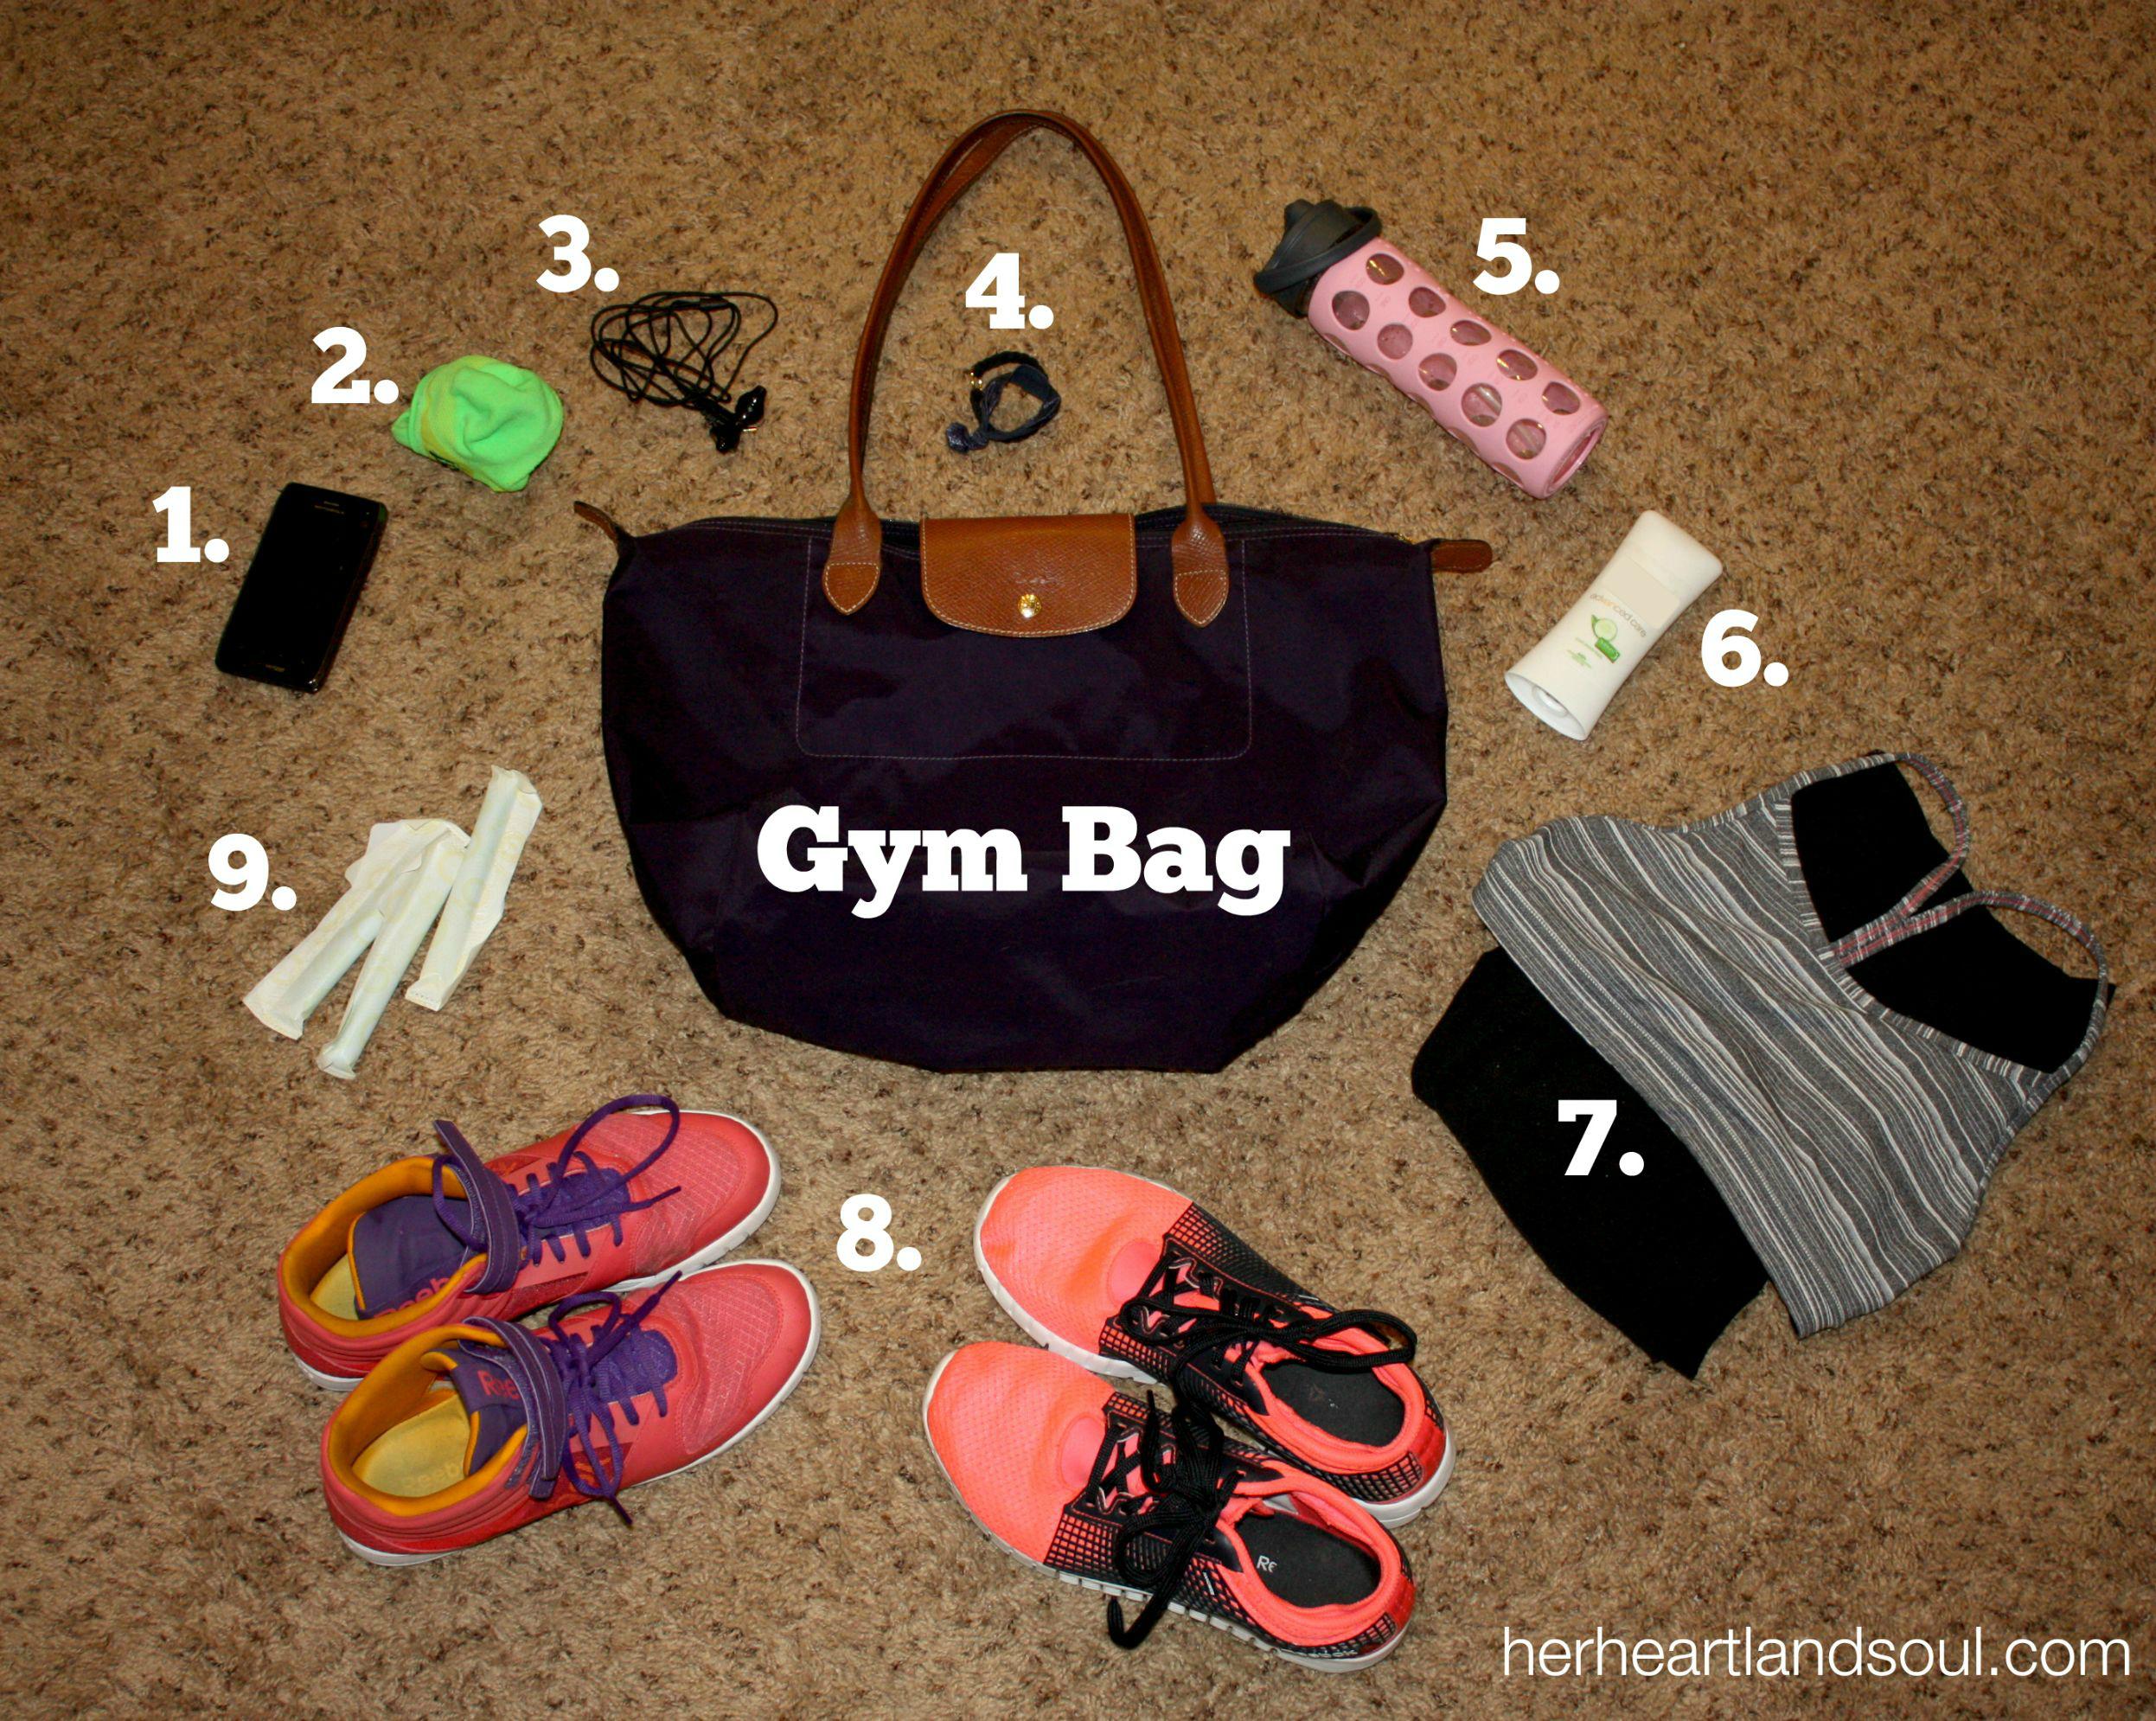 Gym Bag Contents Her Heartland Soul Erin Fairchild